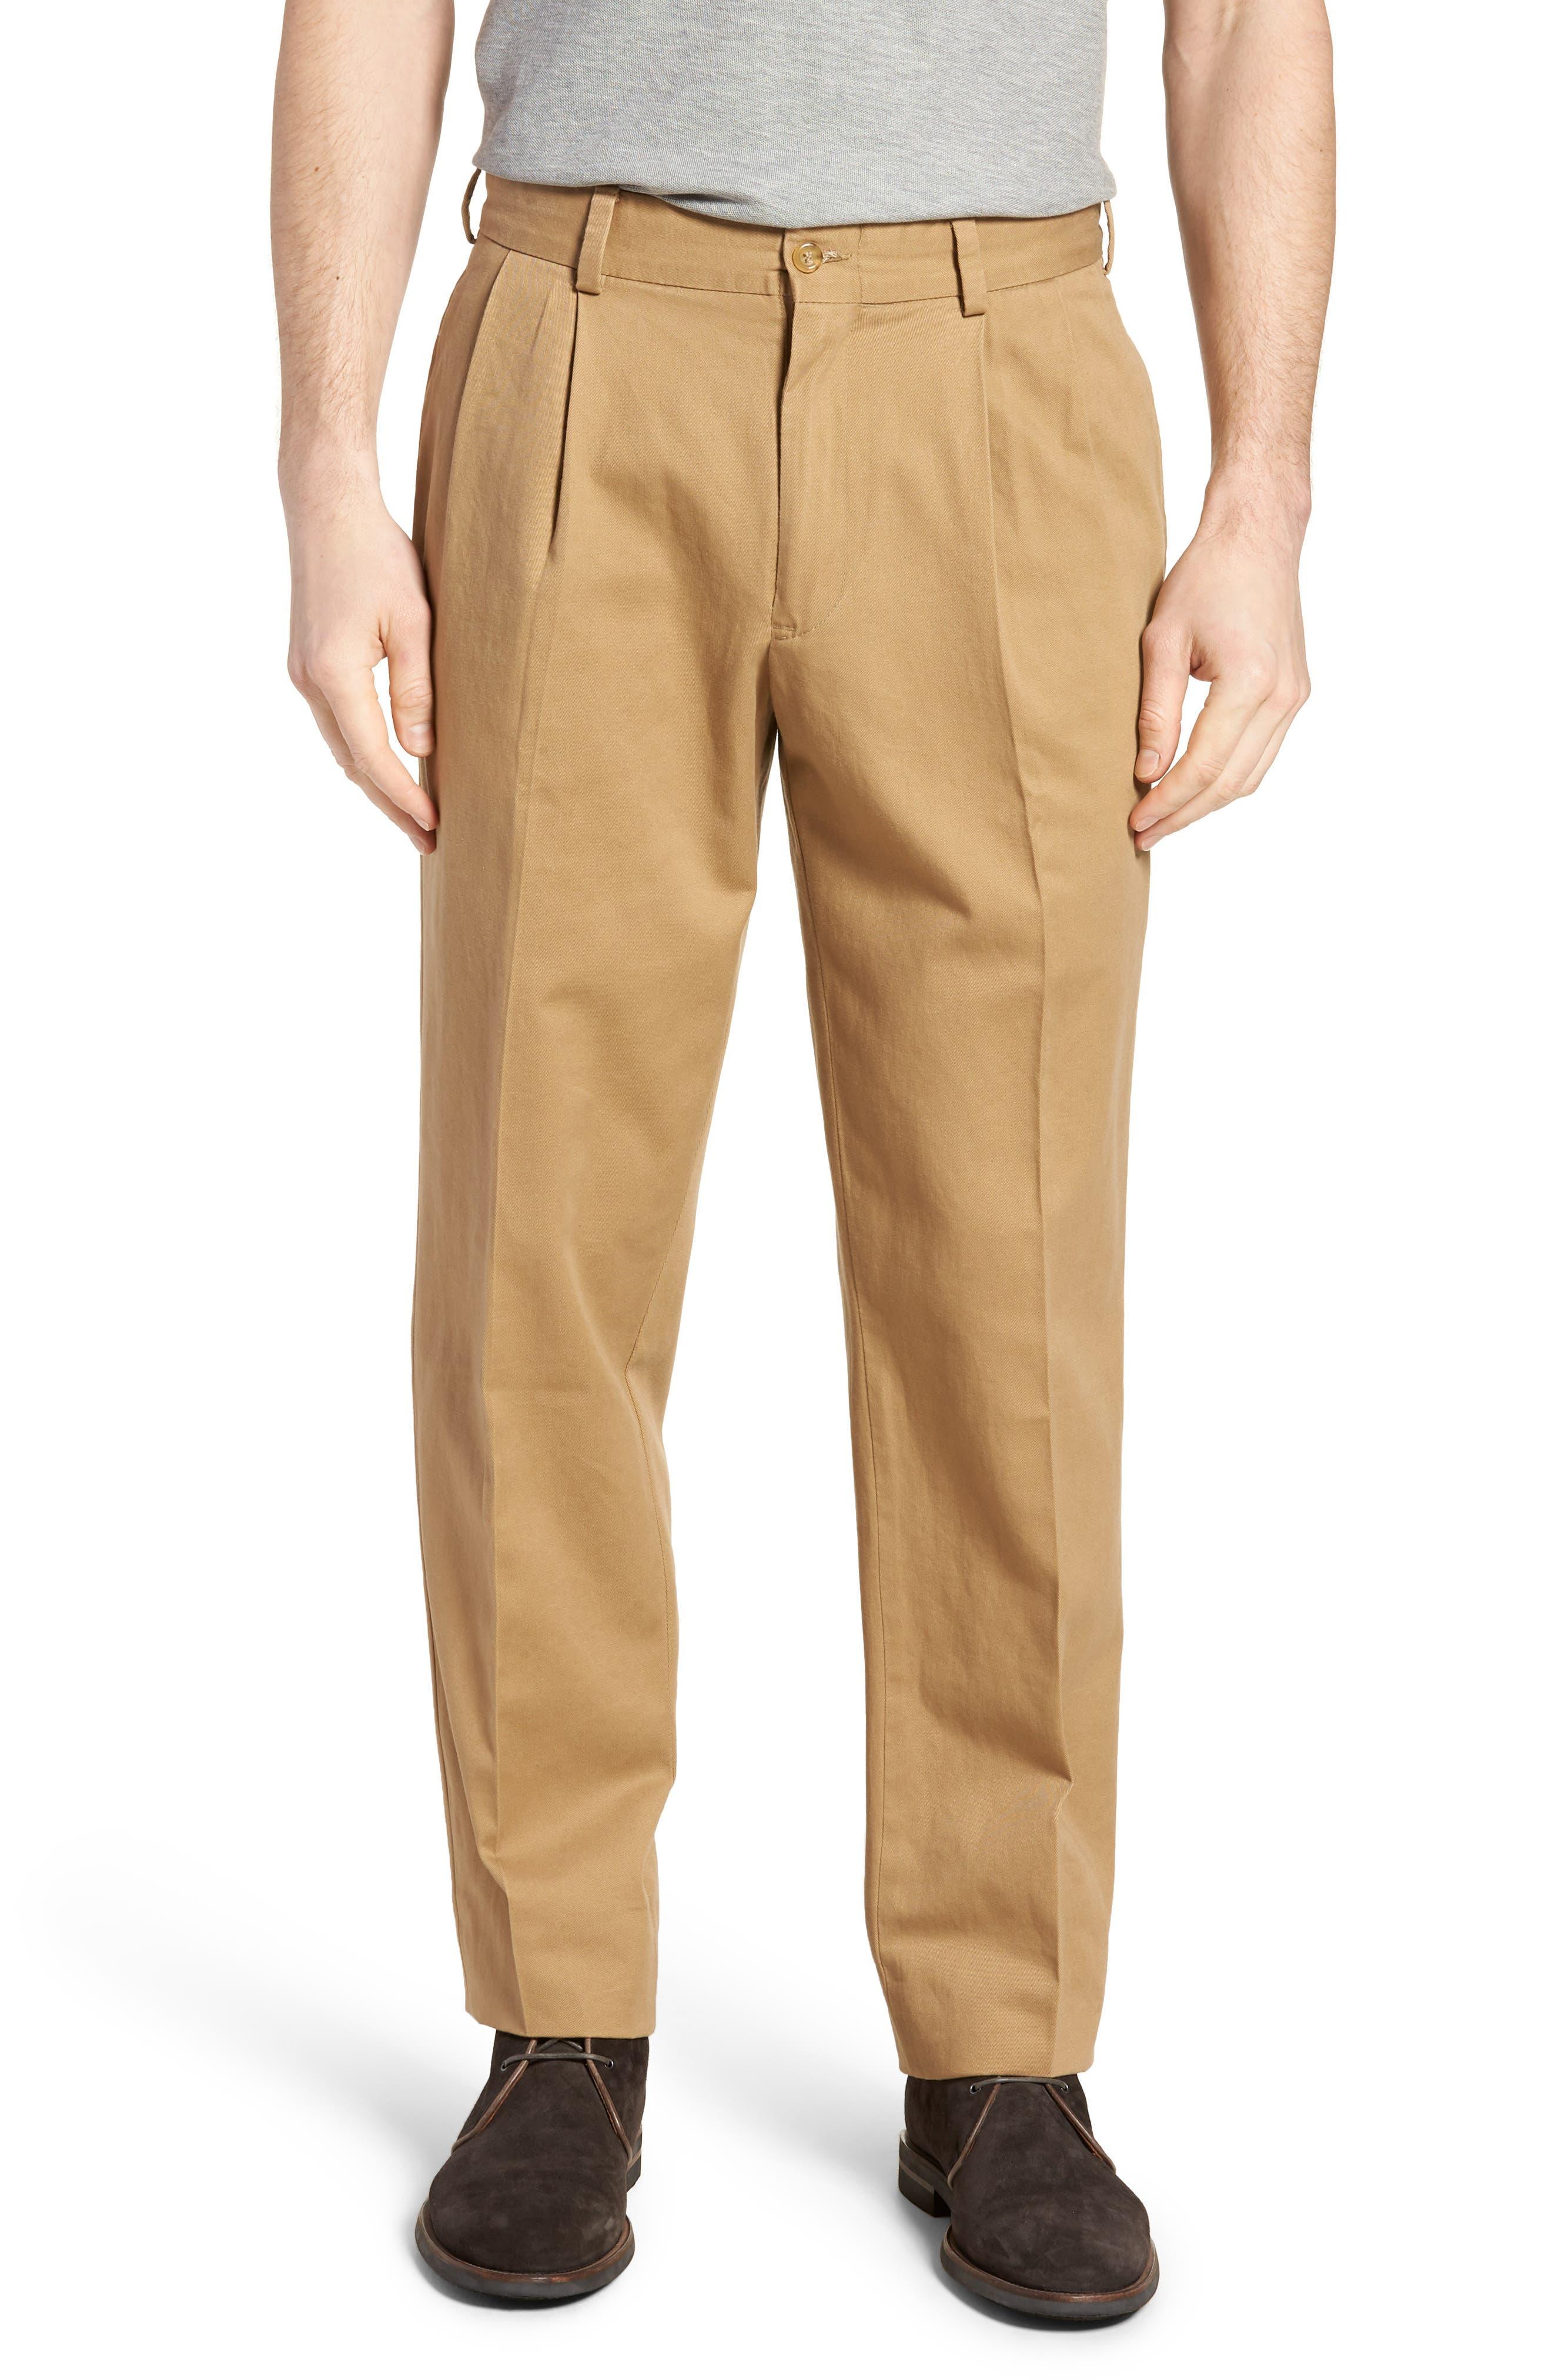 M2 Classic Fit Pleated Vintage Twill Pants,                             Main thumbnail 1, color,                             BRITISH KHAKI